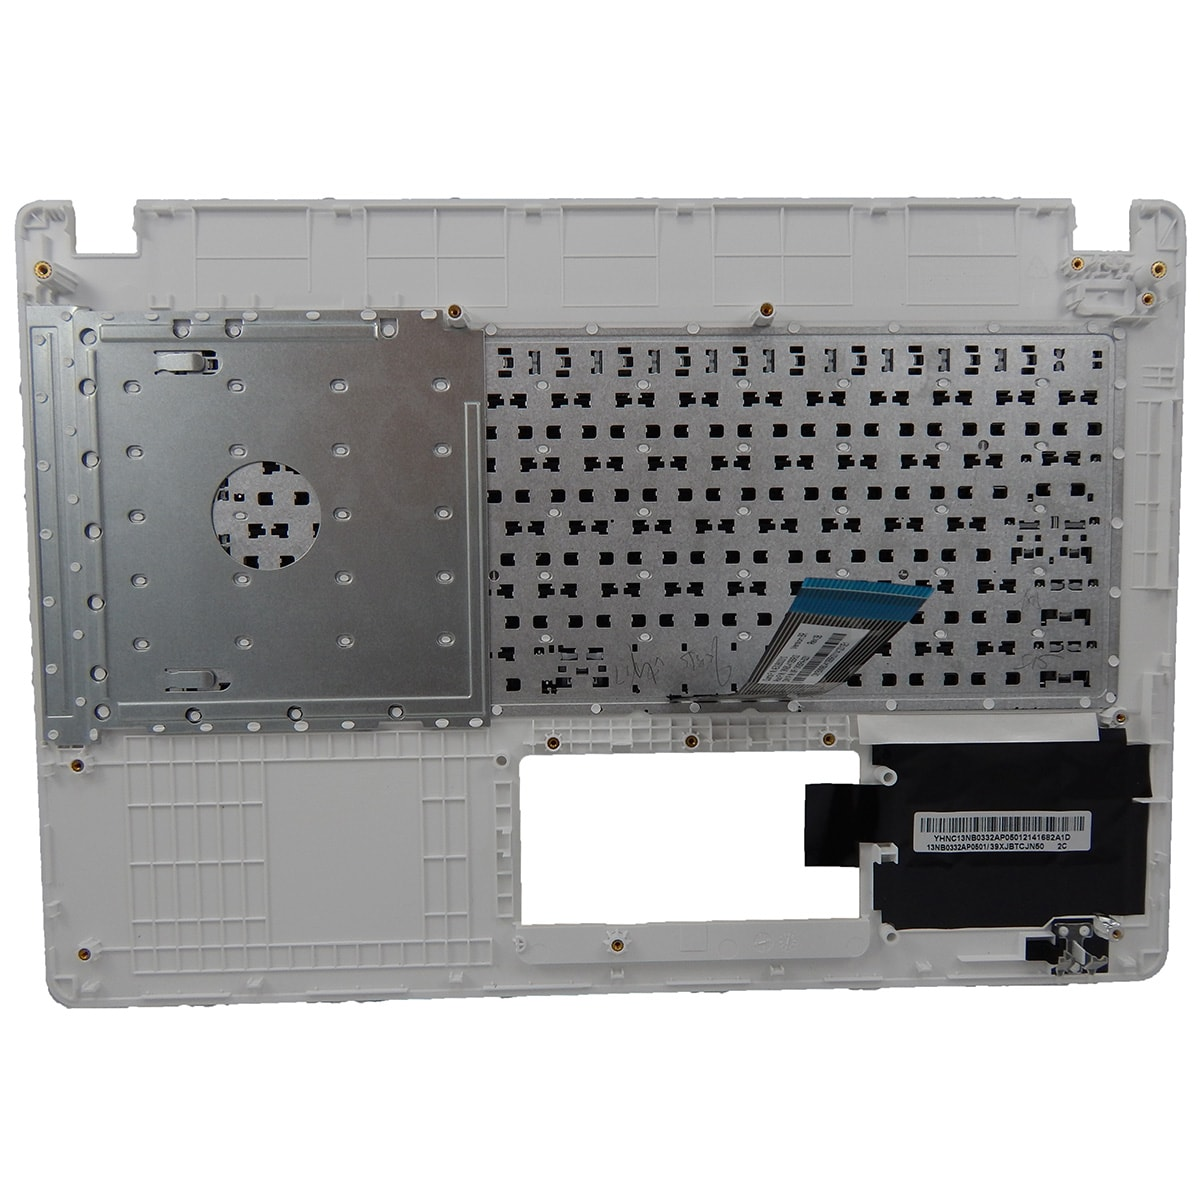 Teclado Ultrabook Asus X451ca/ma c/ Moldura Branca Sem Touch Pn: MP-13K86PA-9201